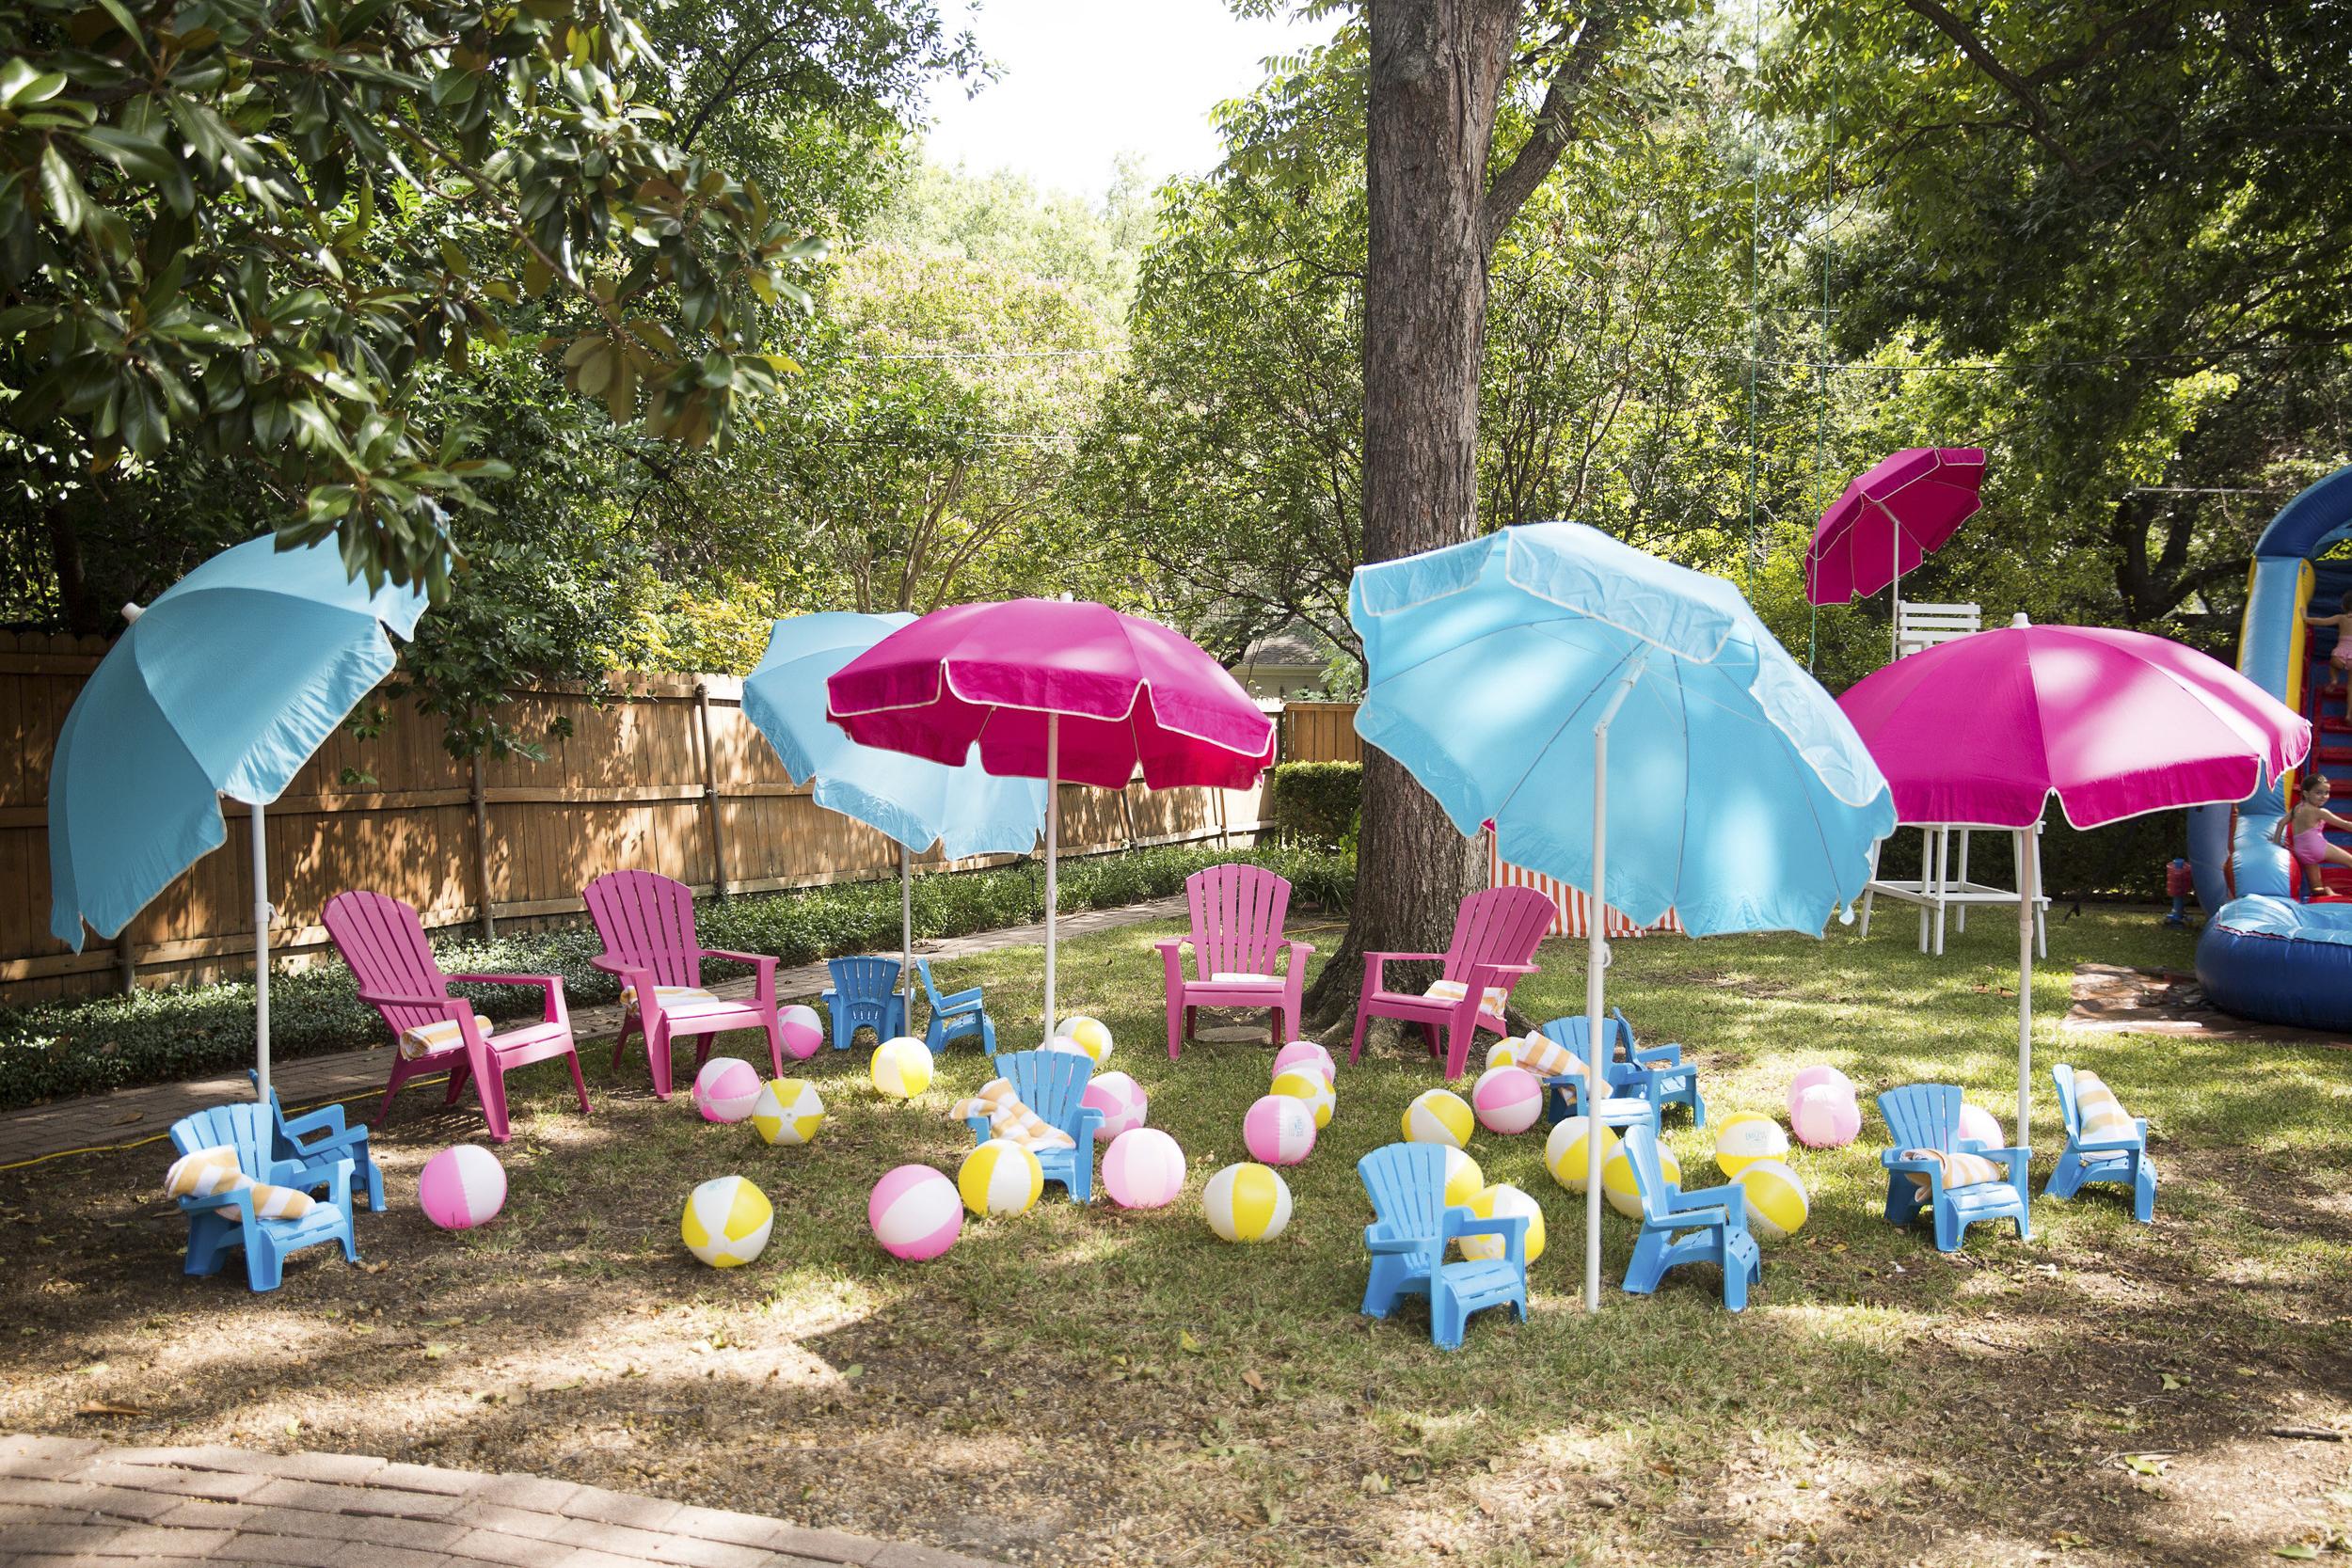 dallas_texas_birthday_party_mae_emily_clarke_events_kids_retro_pool_swim_endless_summer_invitations_ceci_new_york_watercolor_illustration_decor-7.jpg